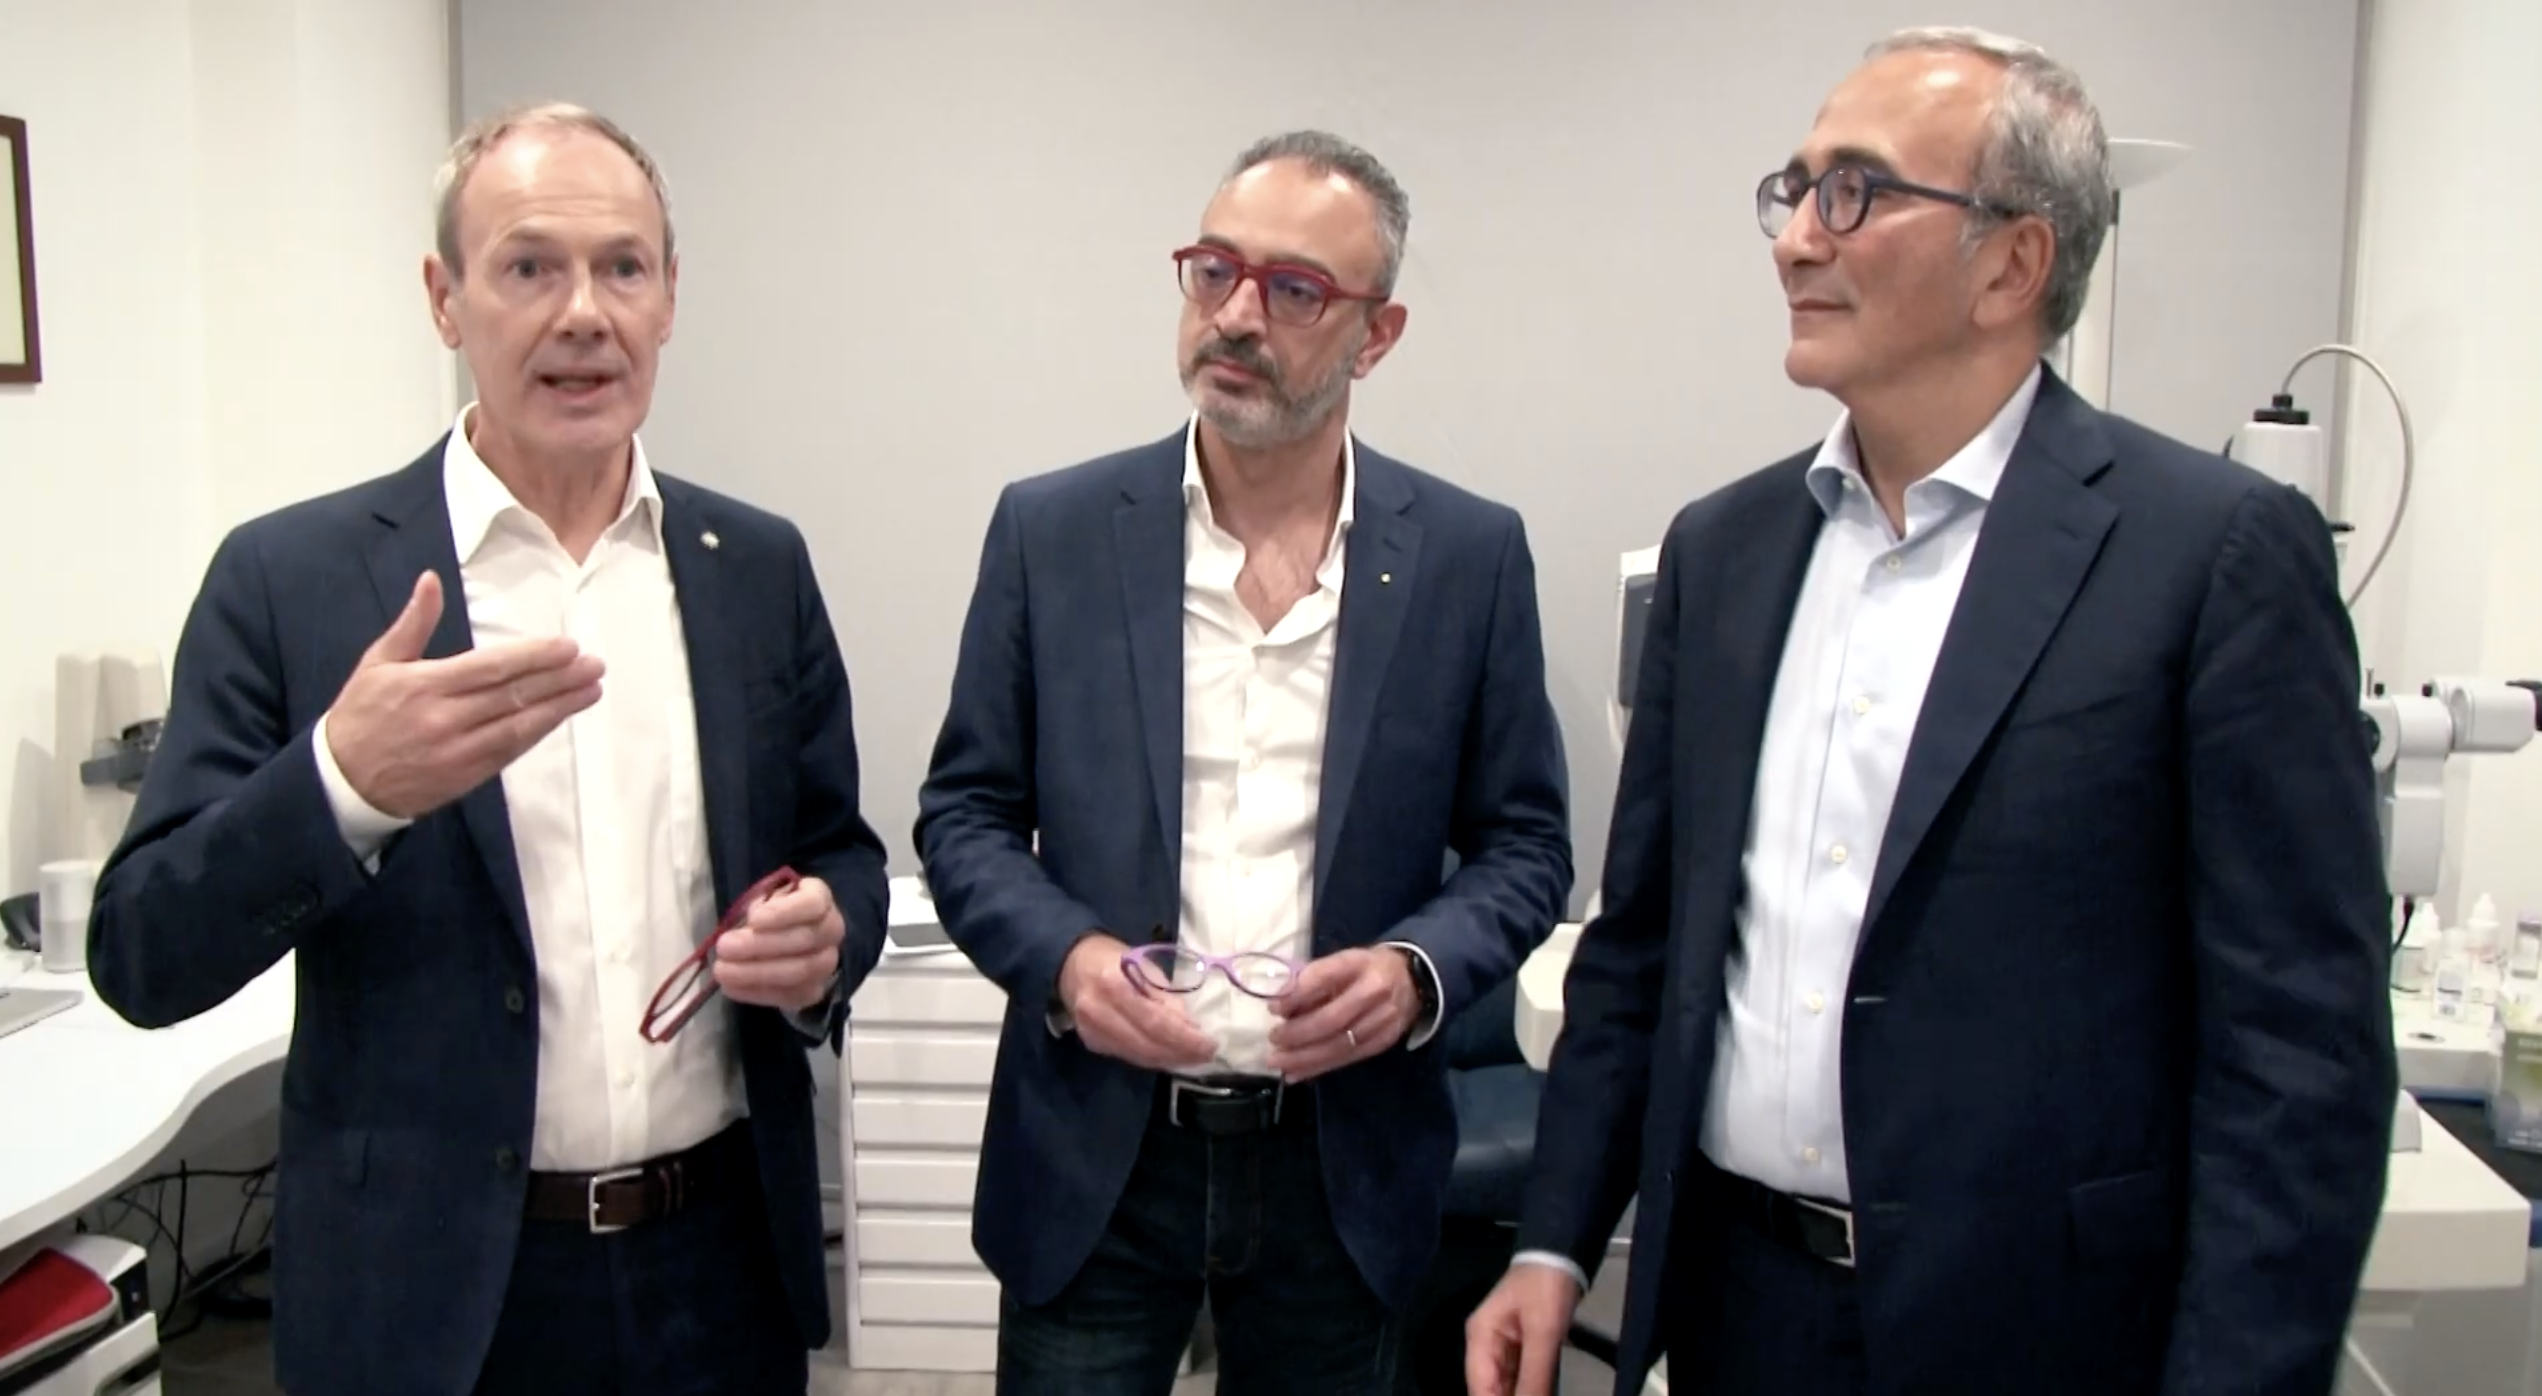 Intervista a Maurizio Veroli, CEO di Hoya Lens Italia